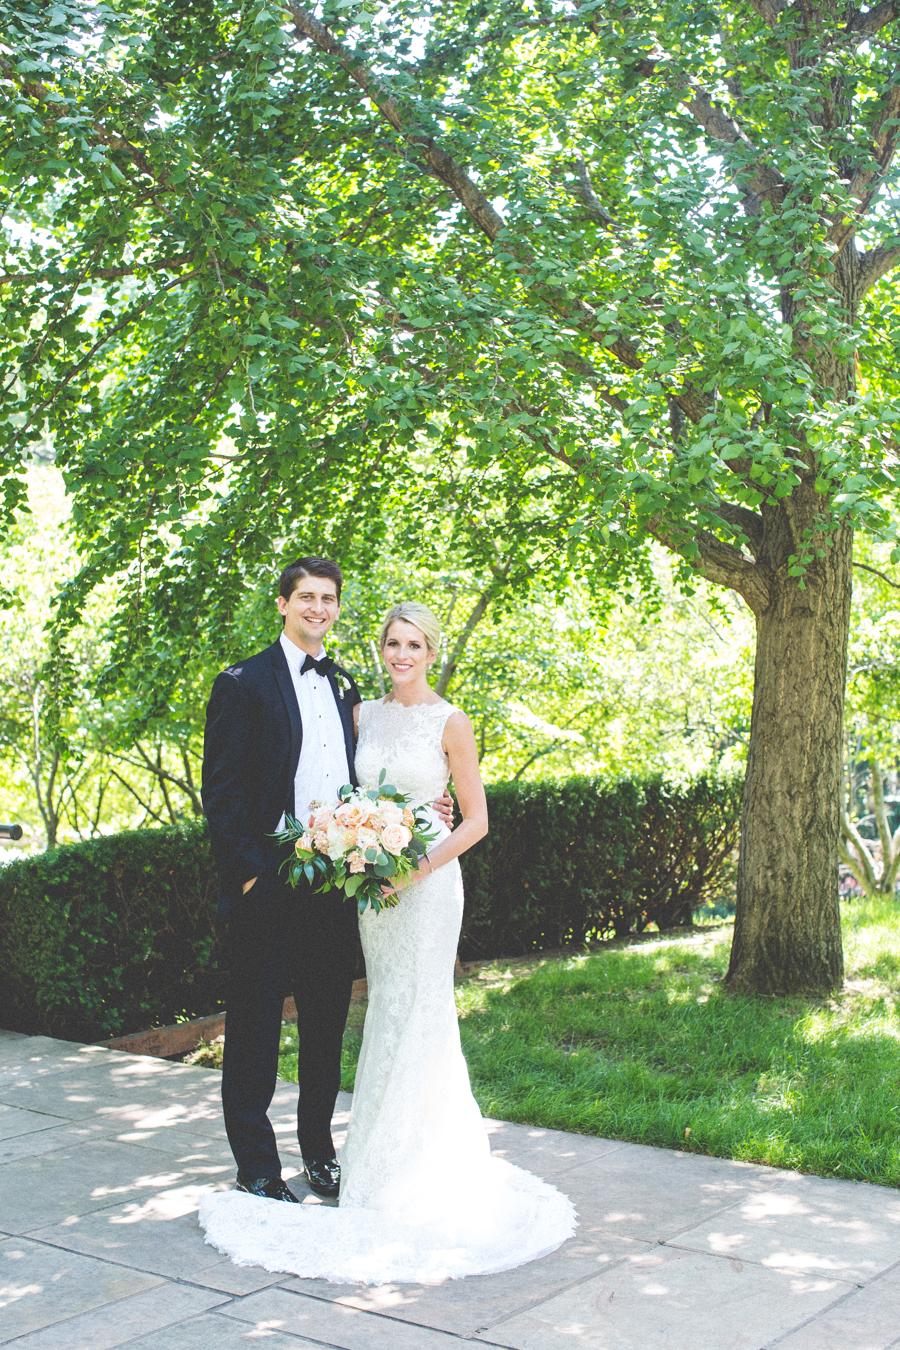 Jill-and-Jeff-Wedding-Blog-1-17.jpg